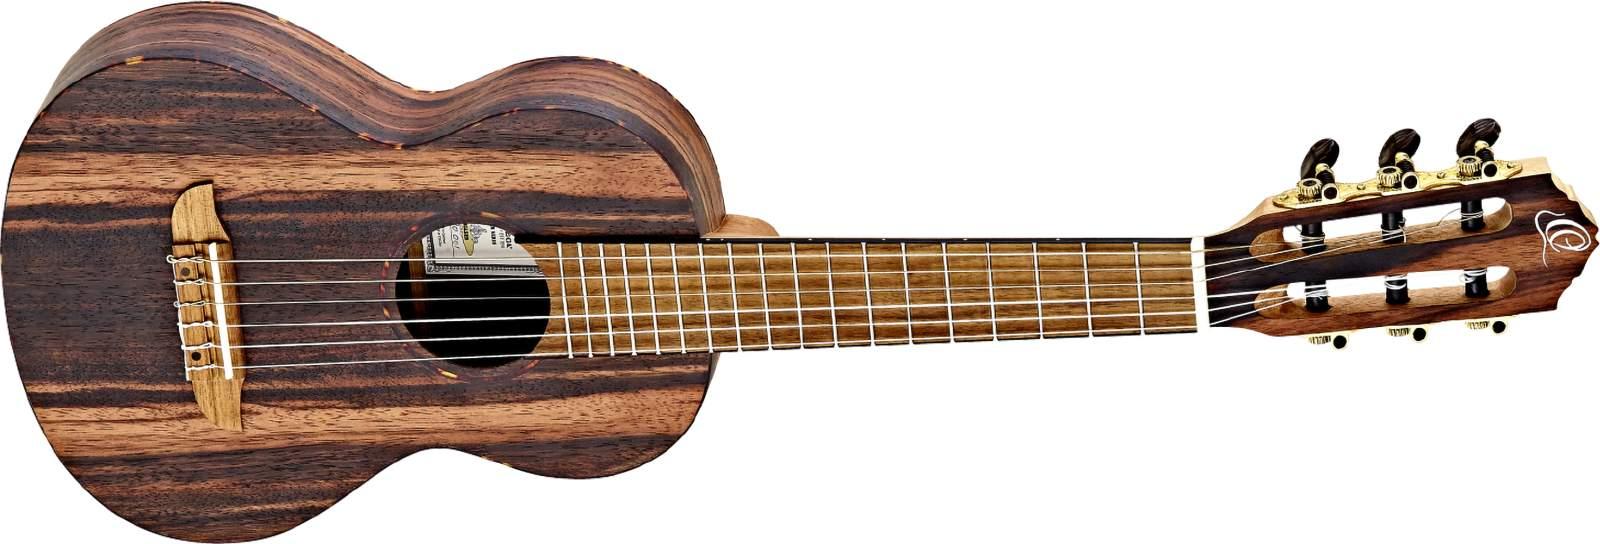 Ortega RGL5EB Guitarlele Ebony